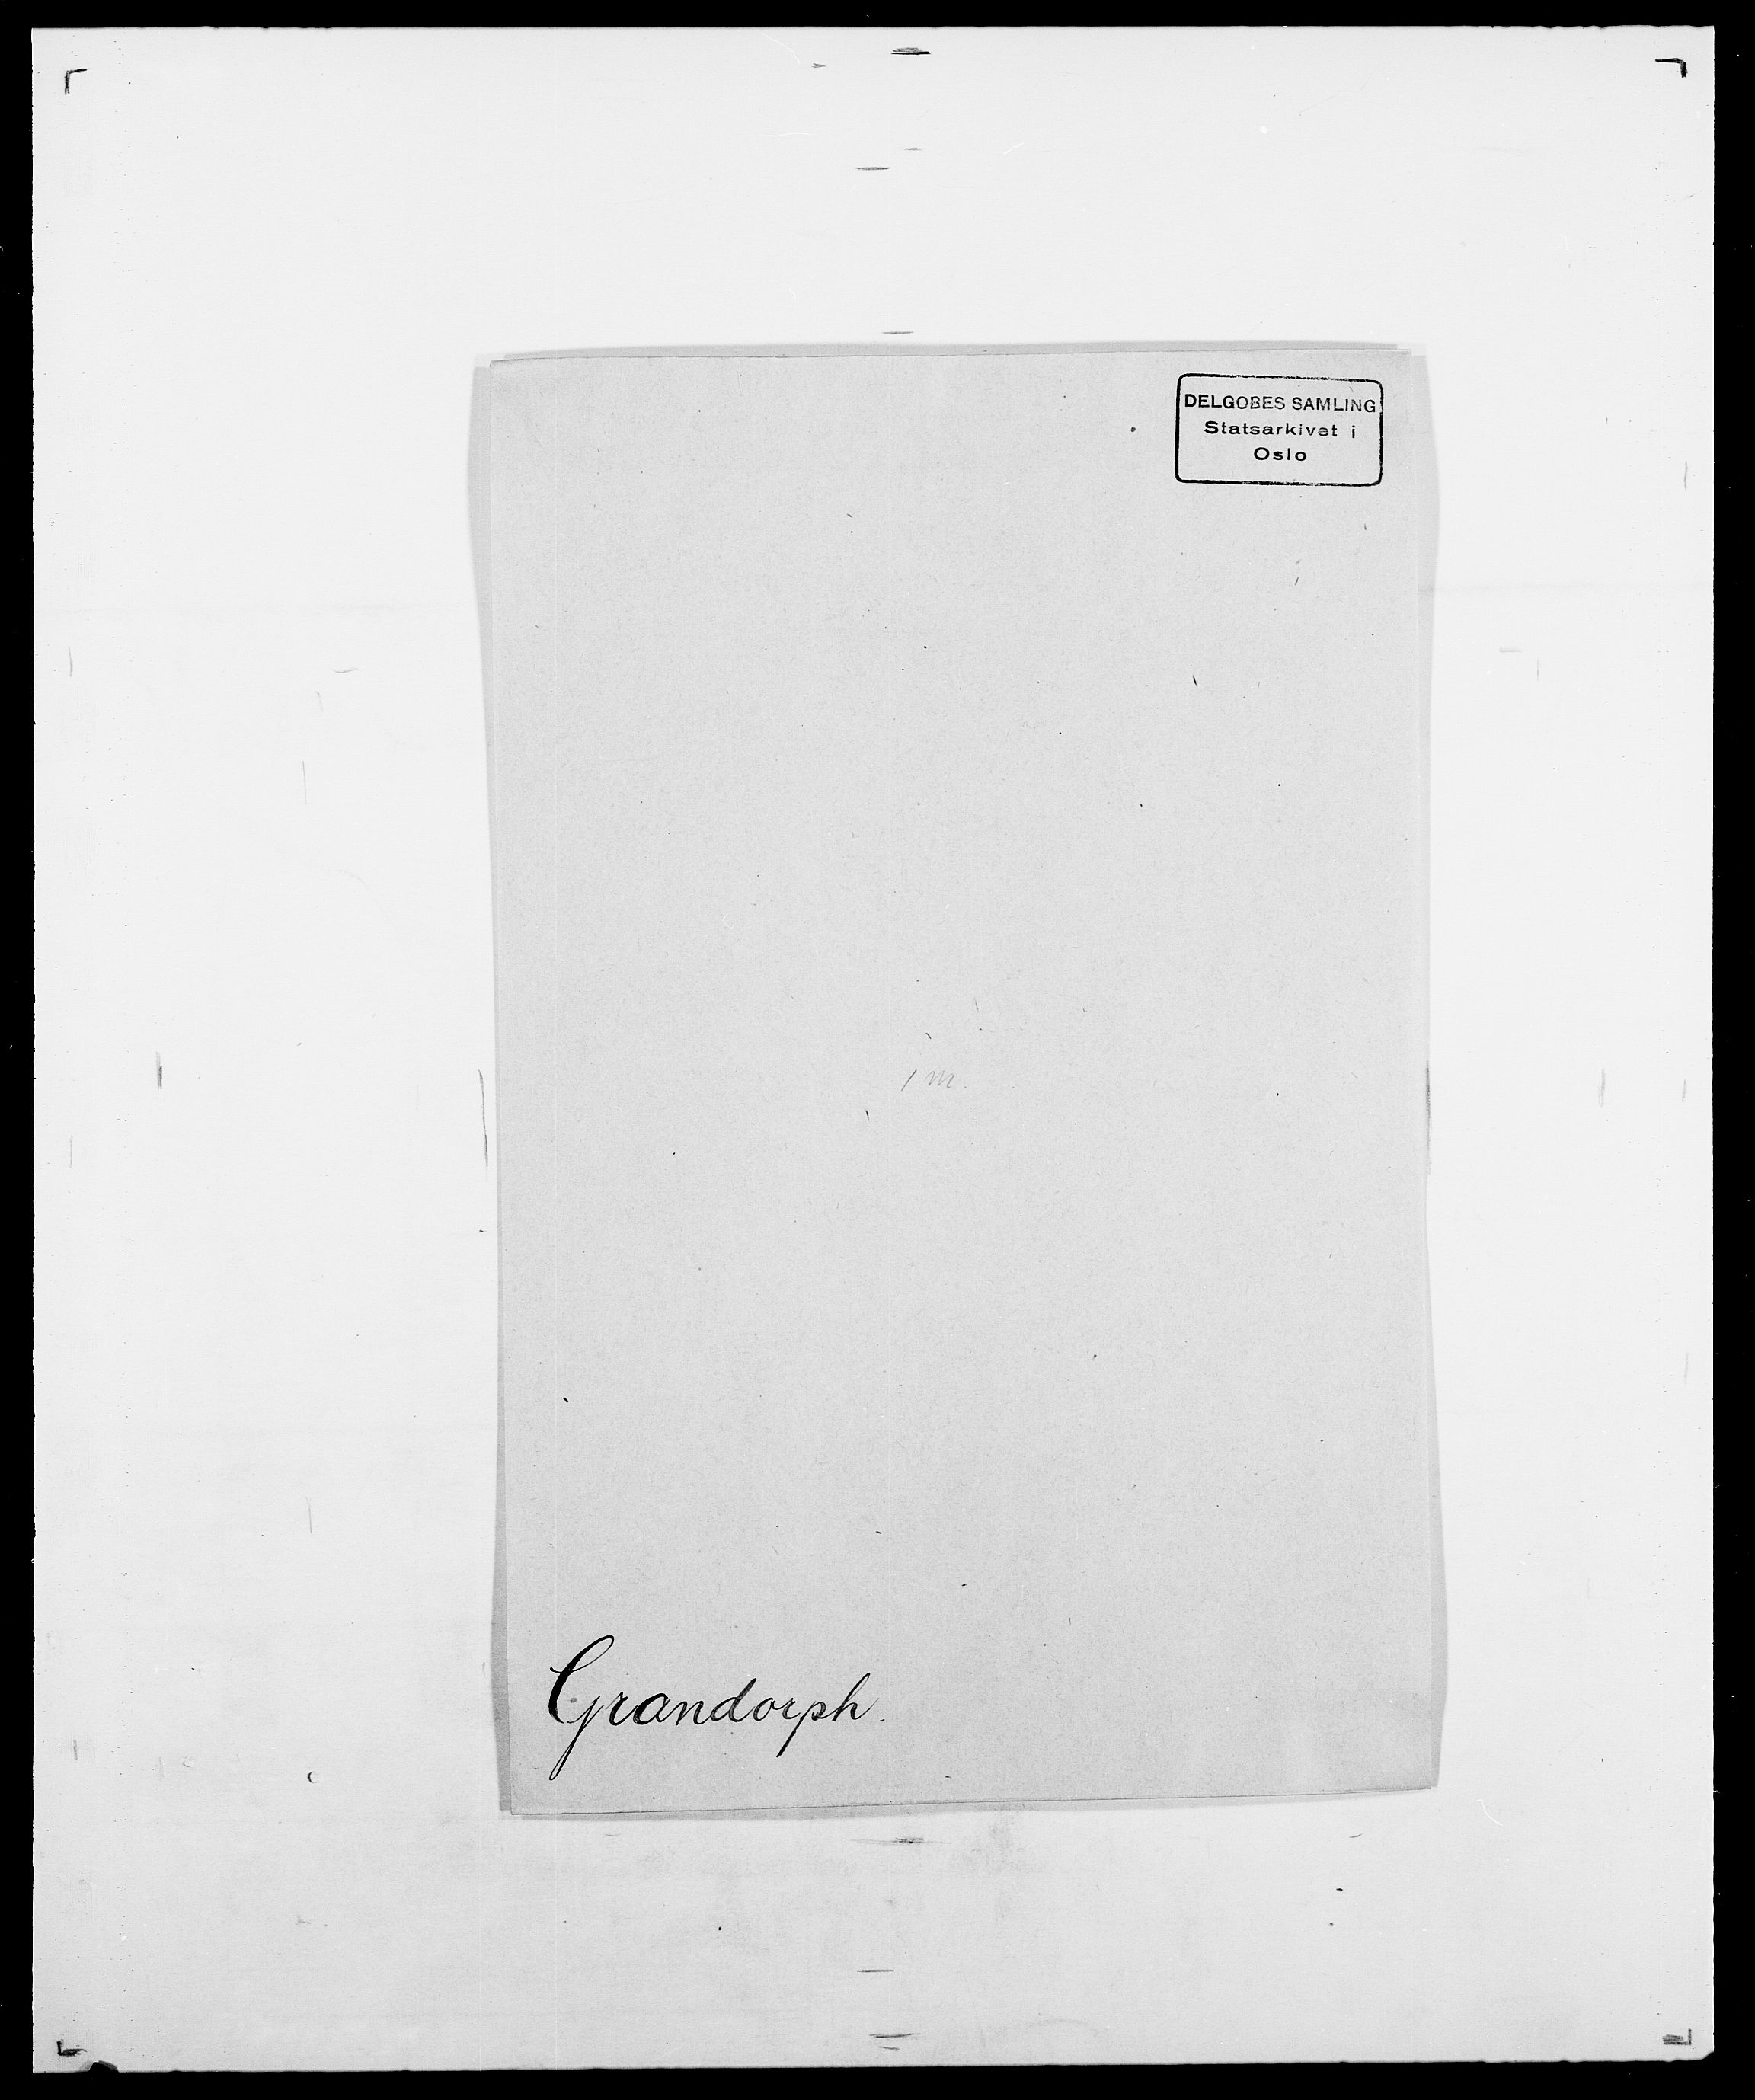 SAO, Delgobe, Charles Antoine - samling, D/Da/L0014: Giebdhausen - Grip, s. 546